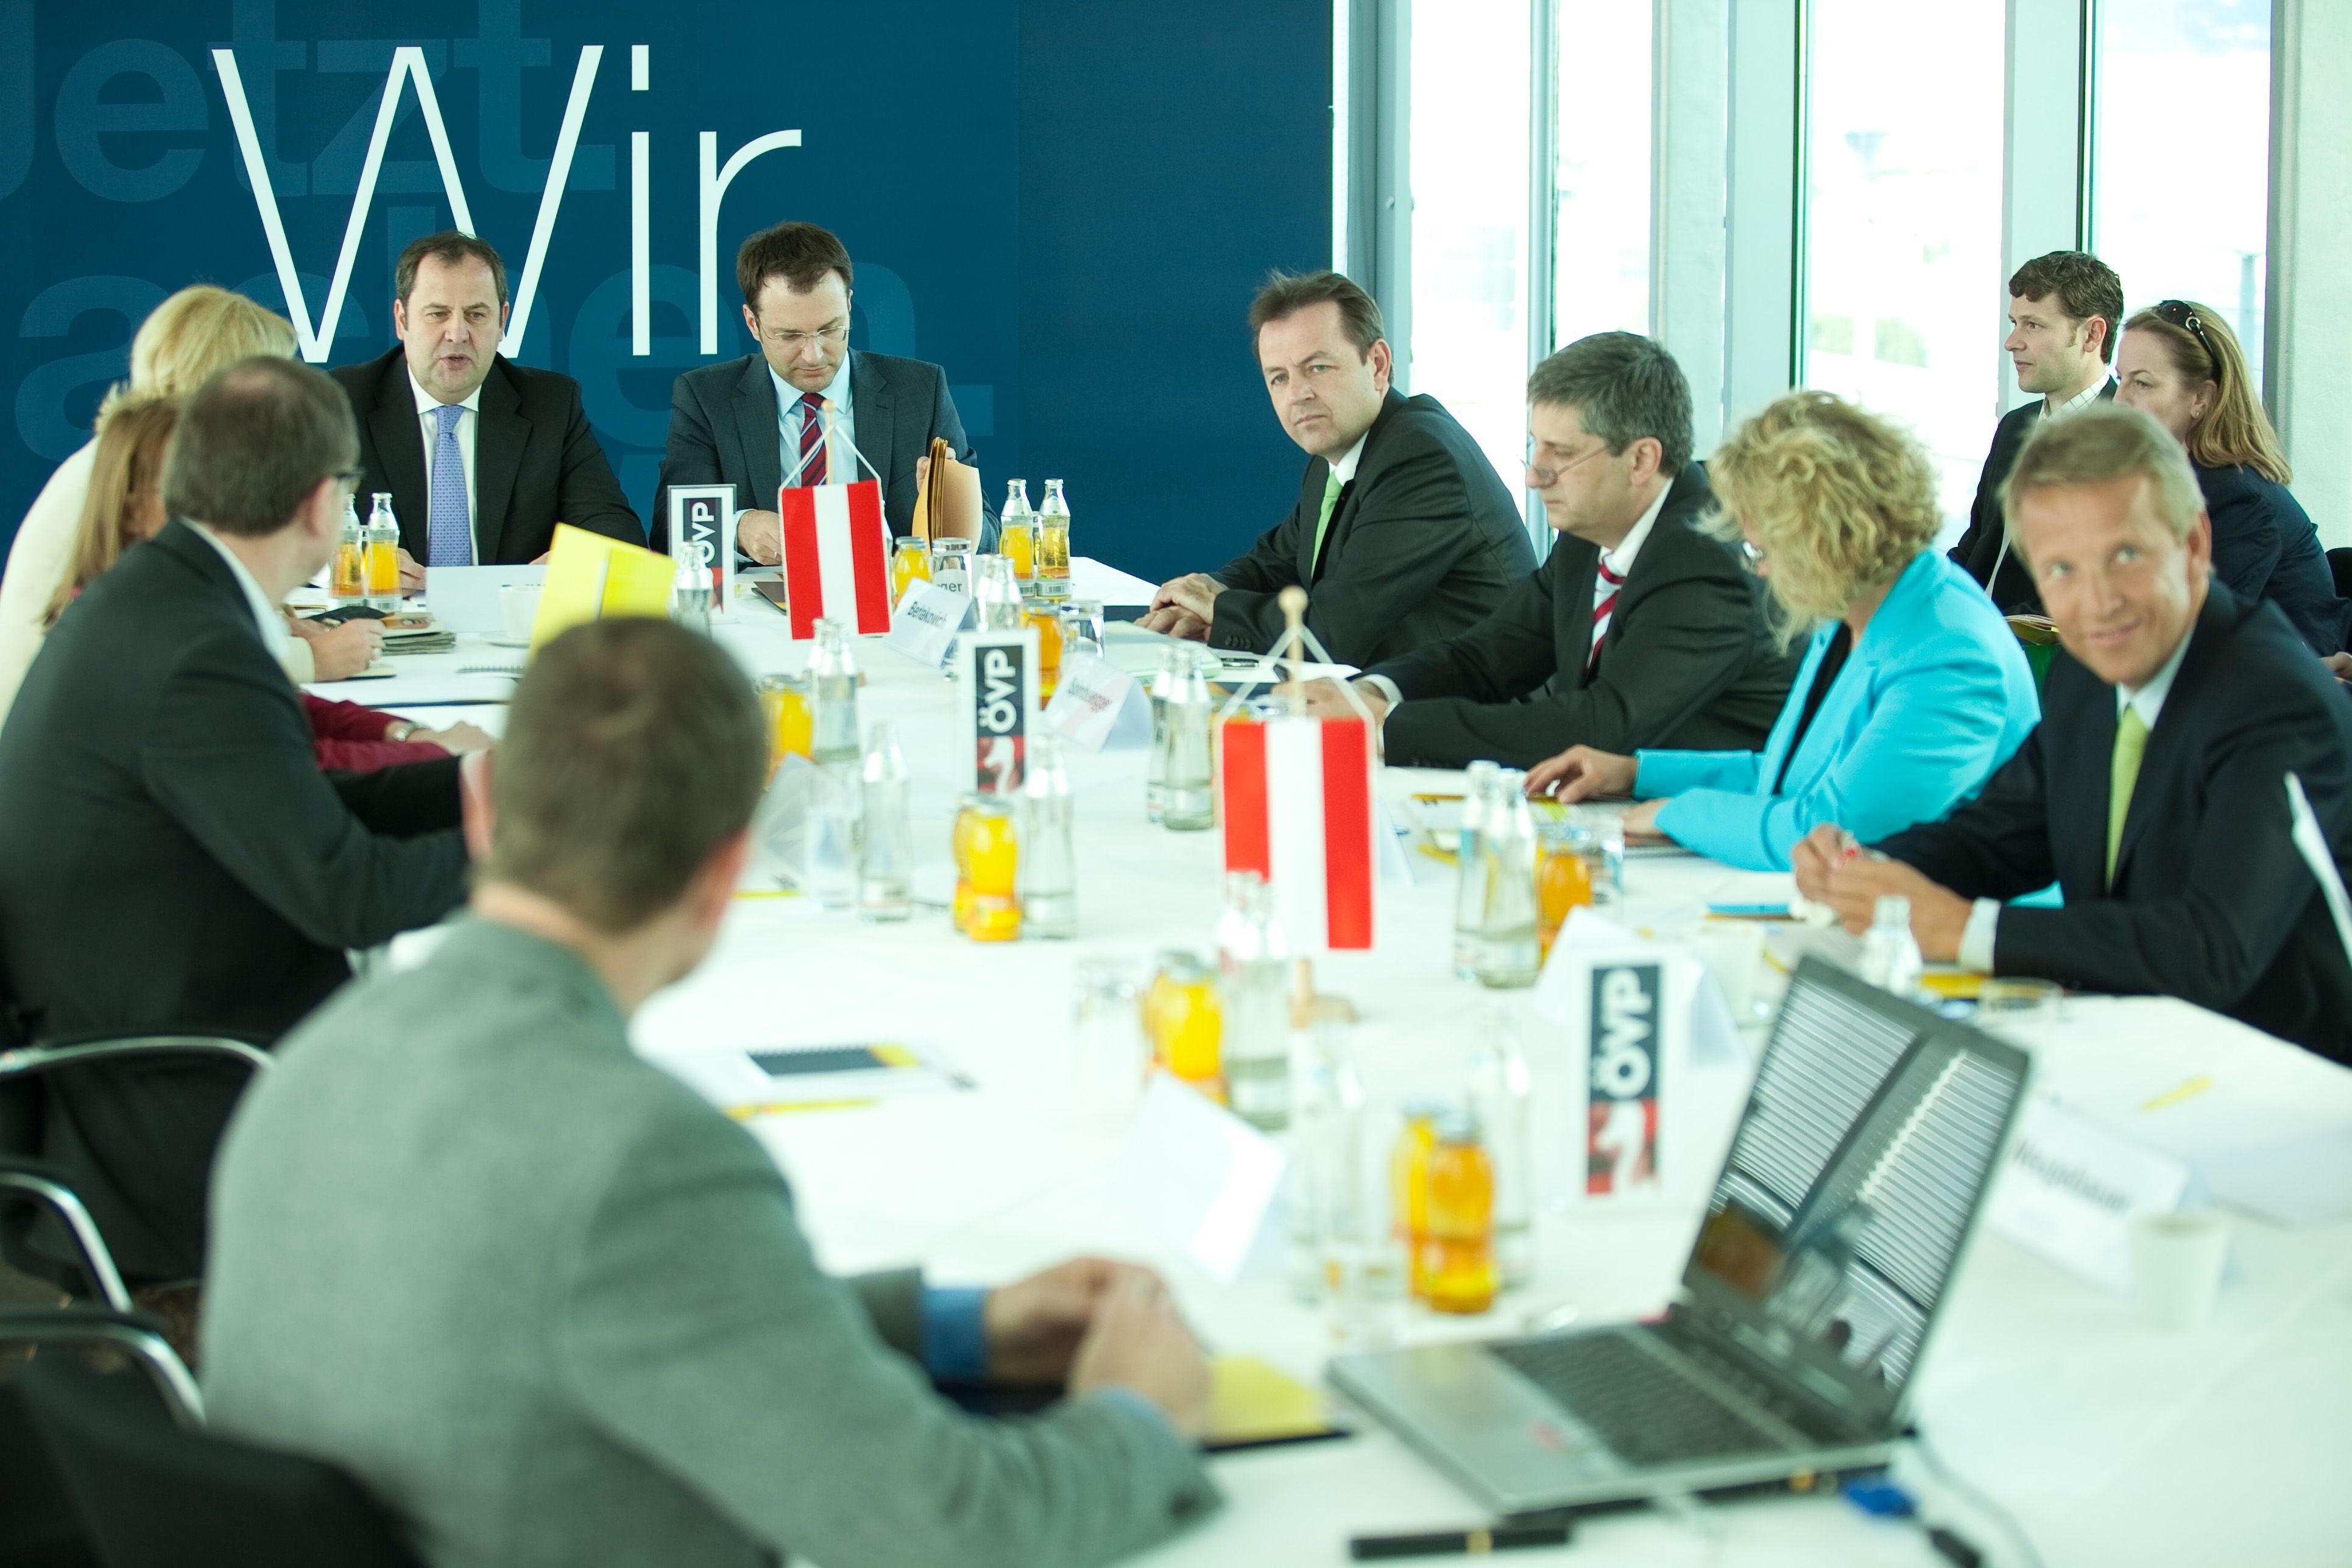 Sitzung des ÖVP-Regierungsteams am 1. Mai (C) ÖVP